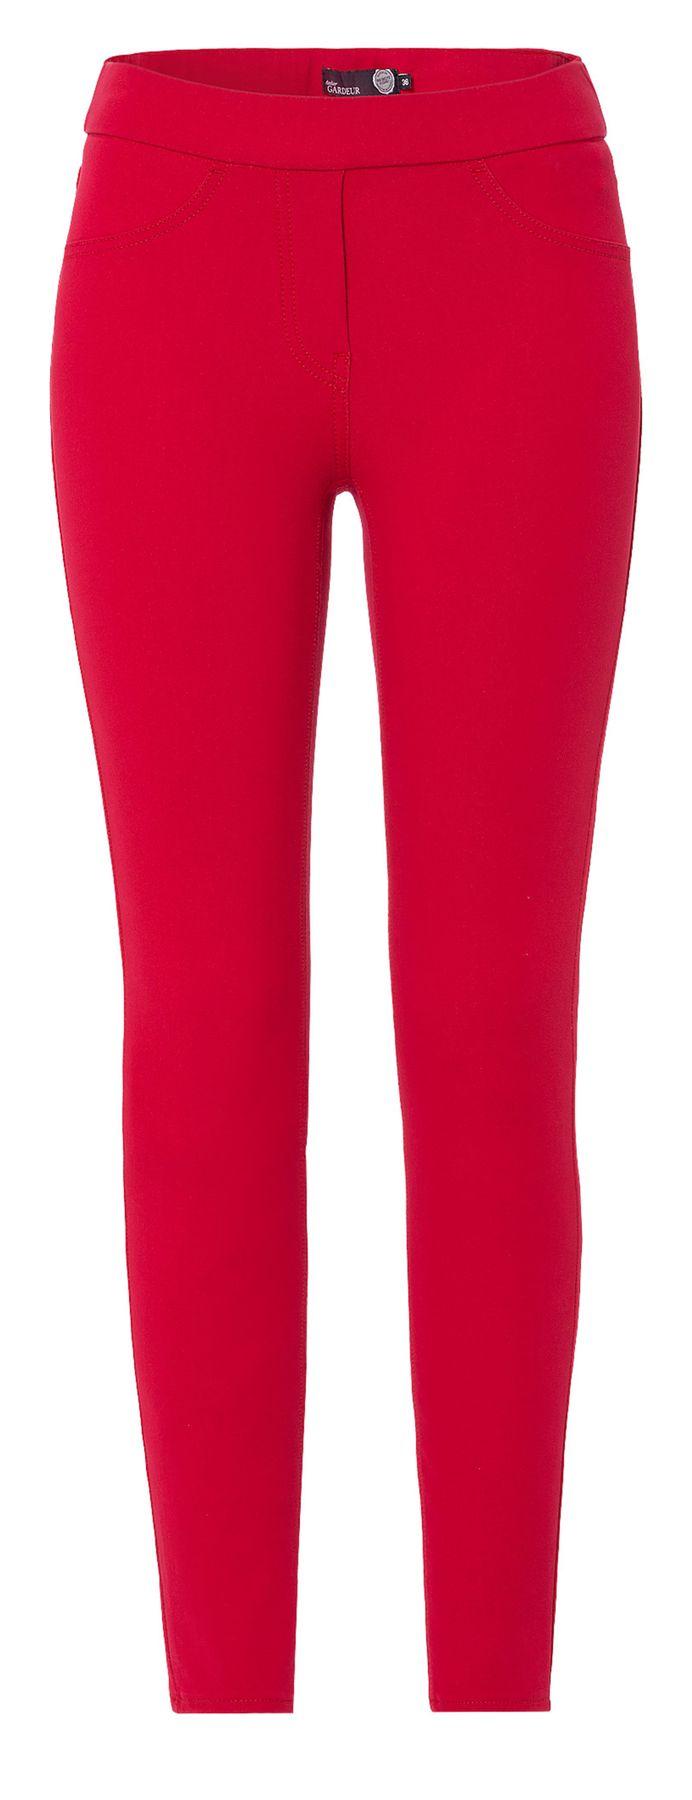 Atelier Gardeur - Skinny Fit - Damen -  verschiedene Farben, Zita3 (061925 ) – Bild 5